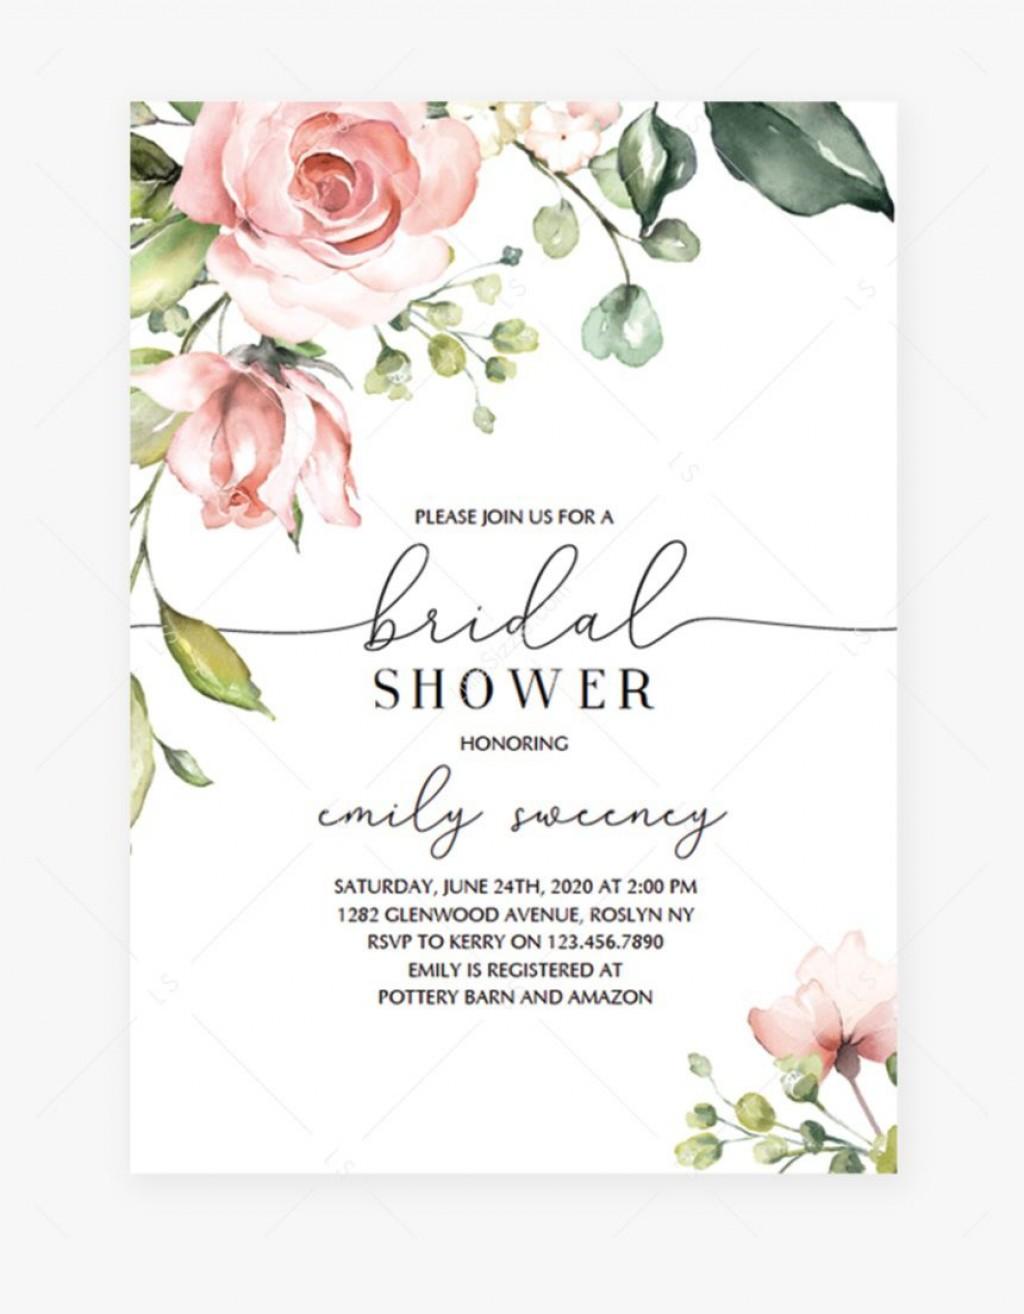 004 Beautiful Free Bridal Shower Invite Template Highest Clarity  Invitation For Word Wedding MicrosoftLarge